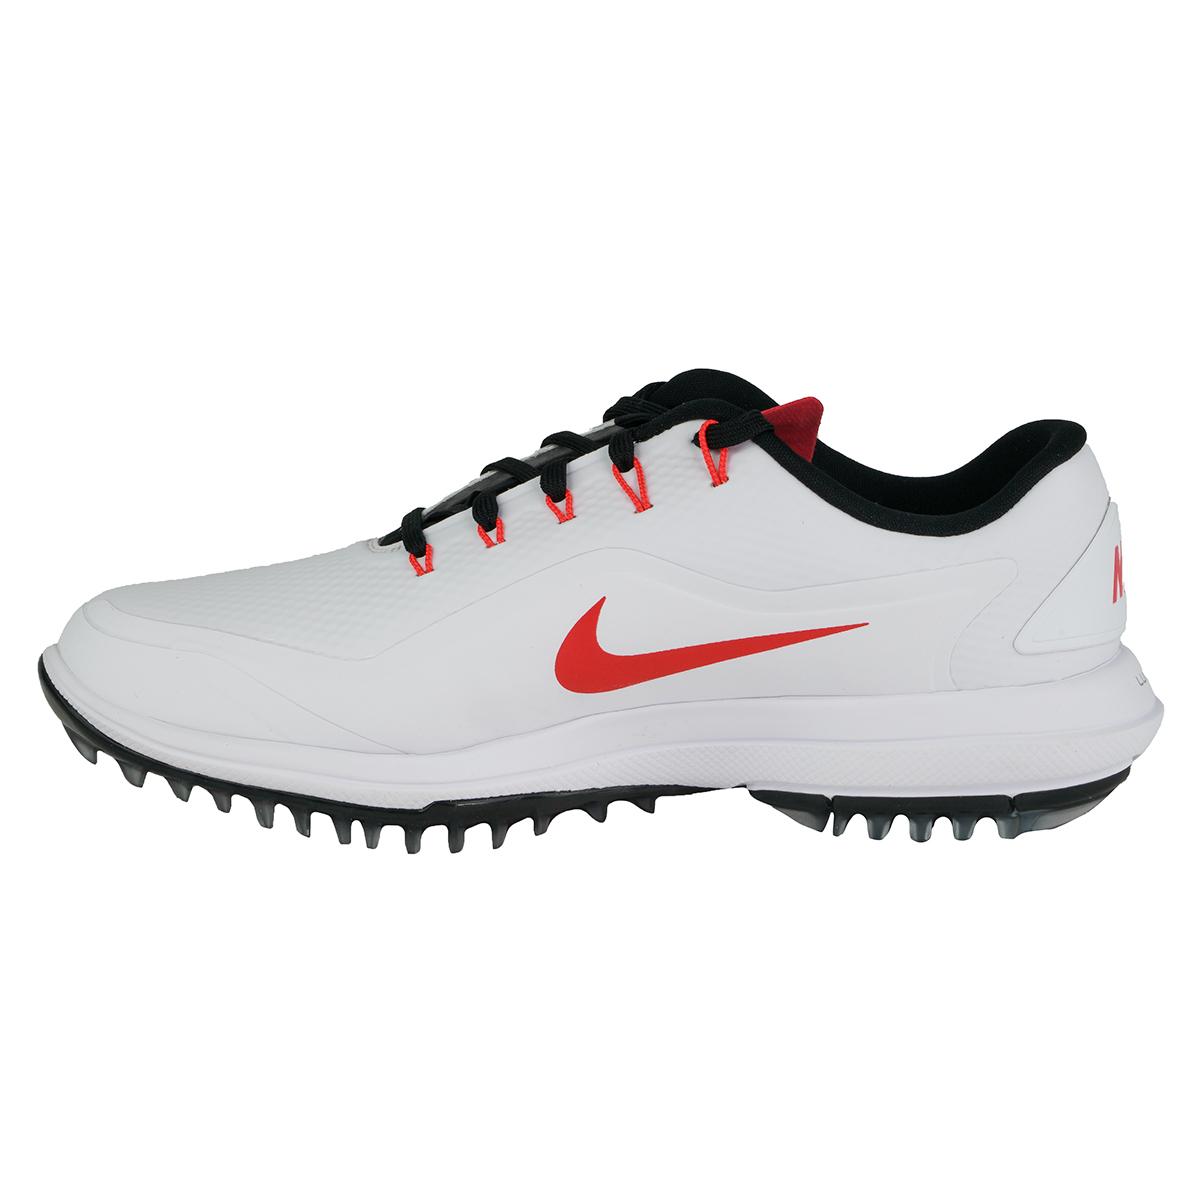 Nike Men s Lunar Control Vapor 2 Golf Shoes White Tropical Pink Black 11 W 440434585